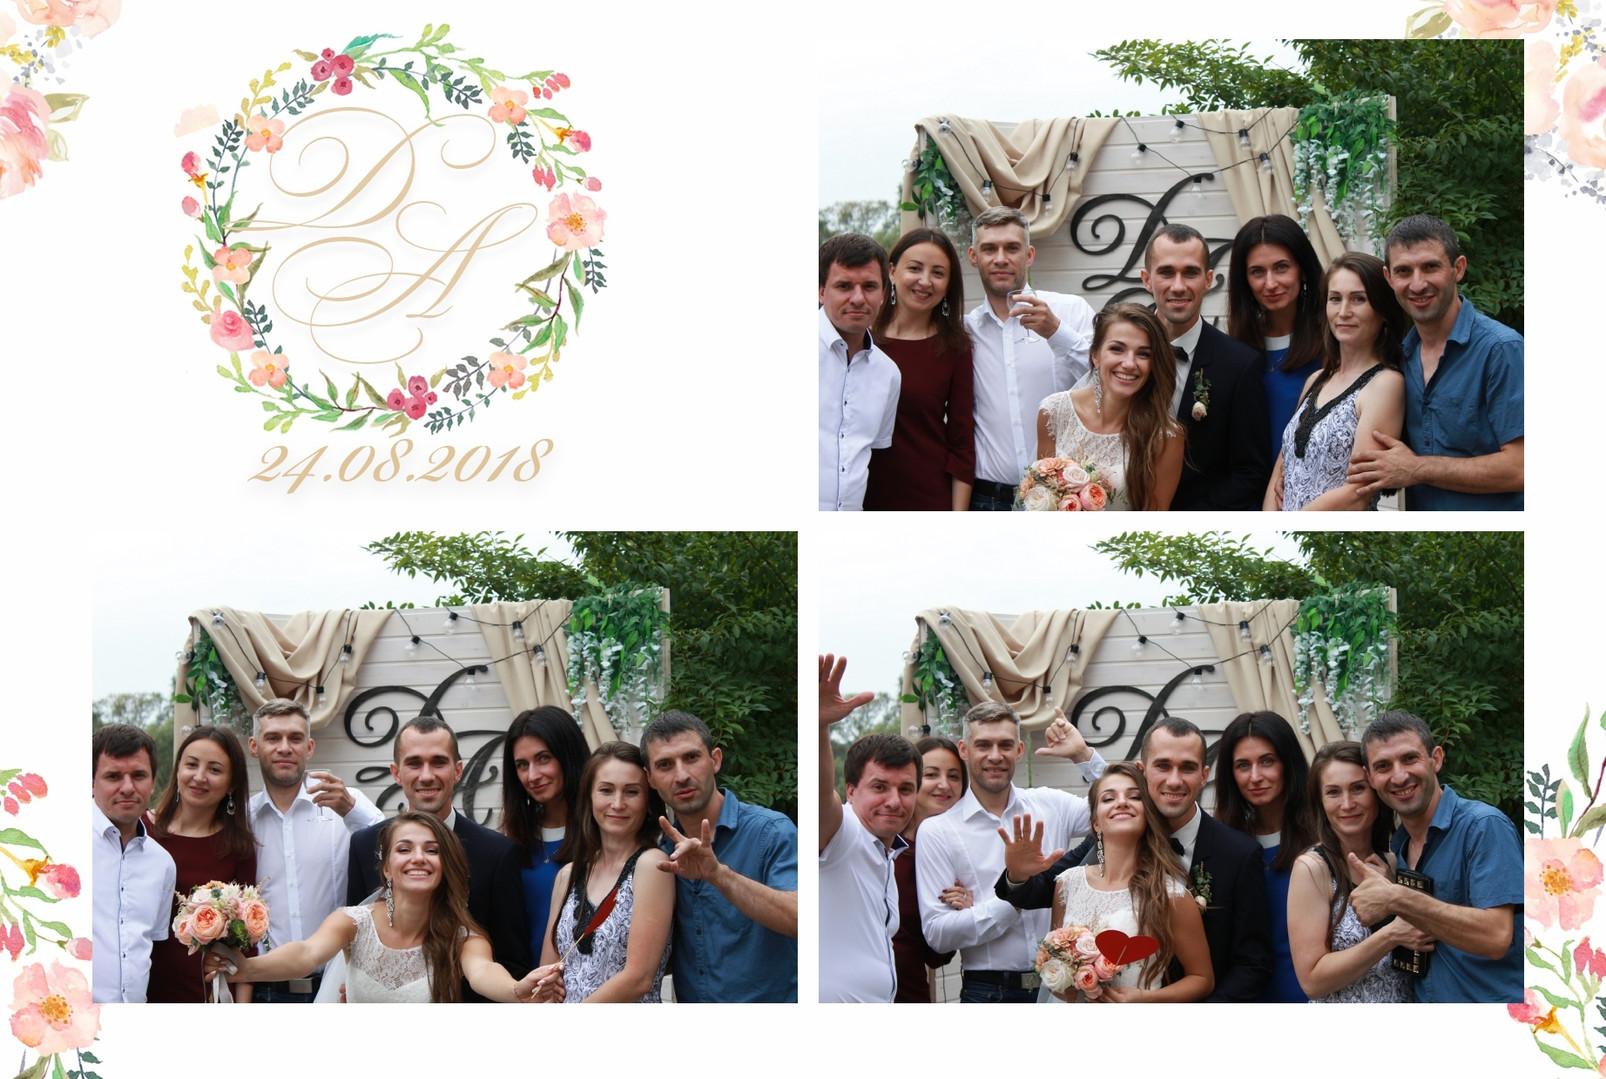 фотобудка на свадьбу.jpg